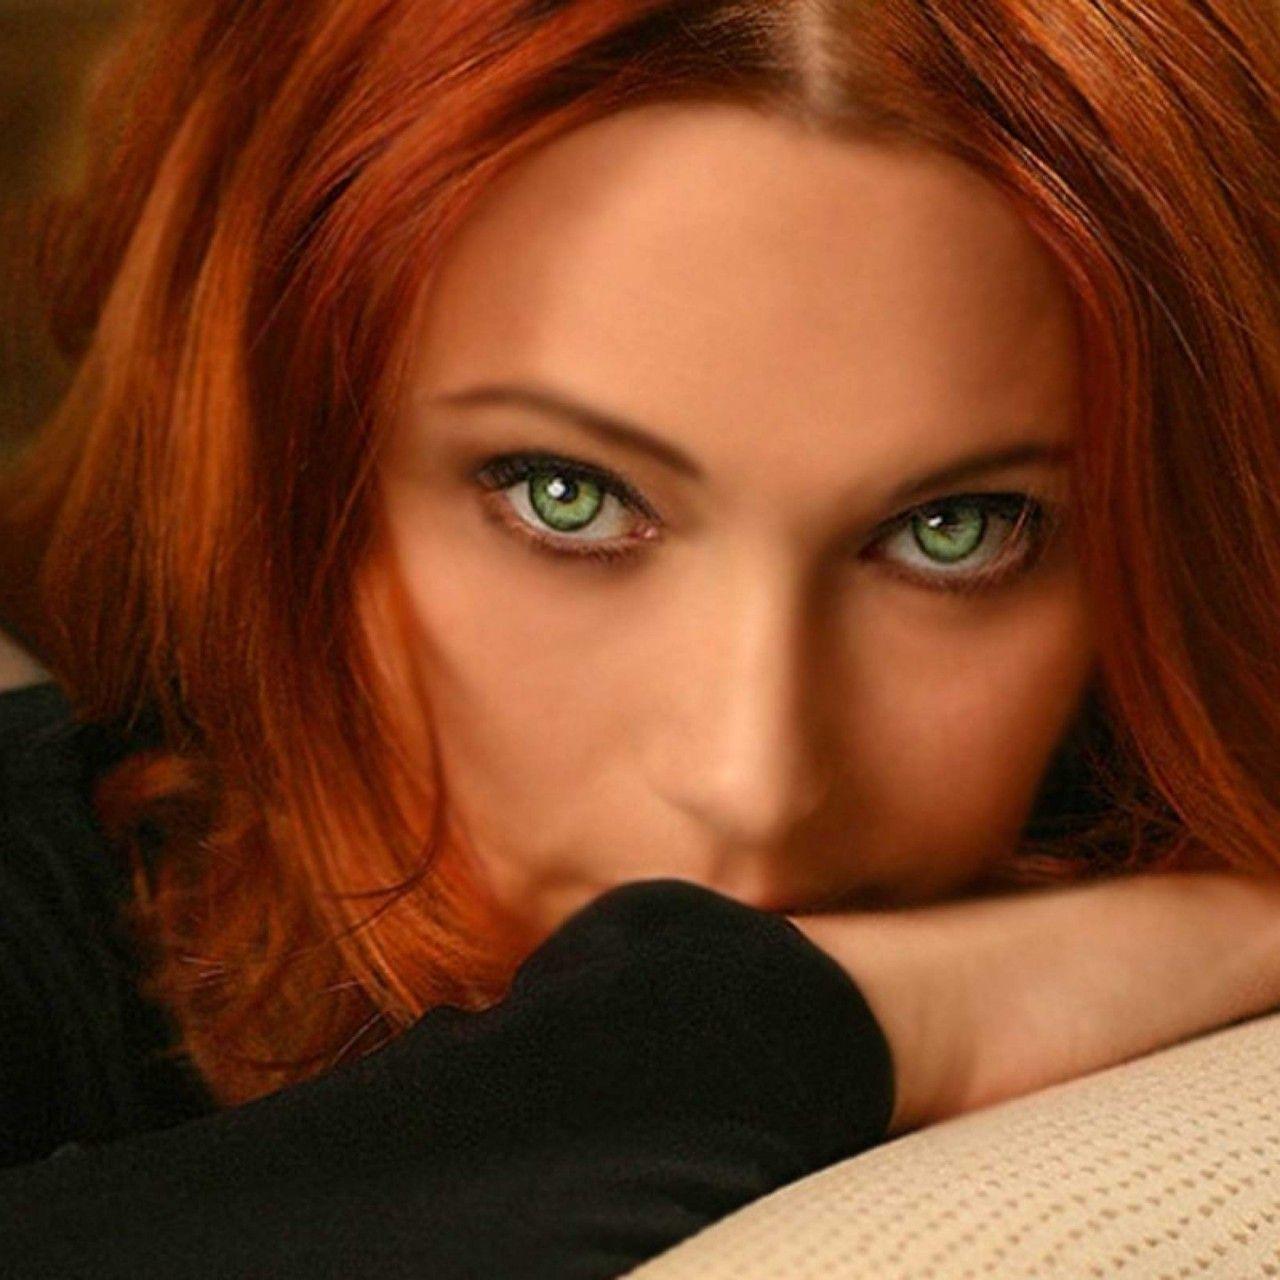 Redhead milf eye green